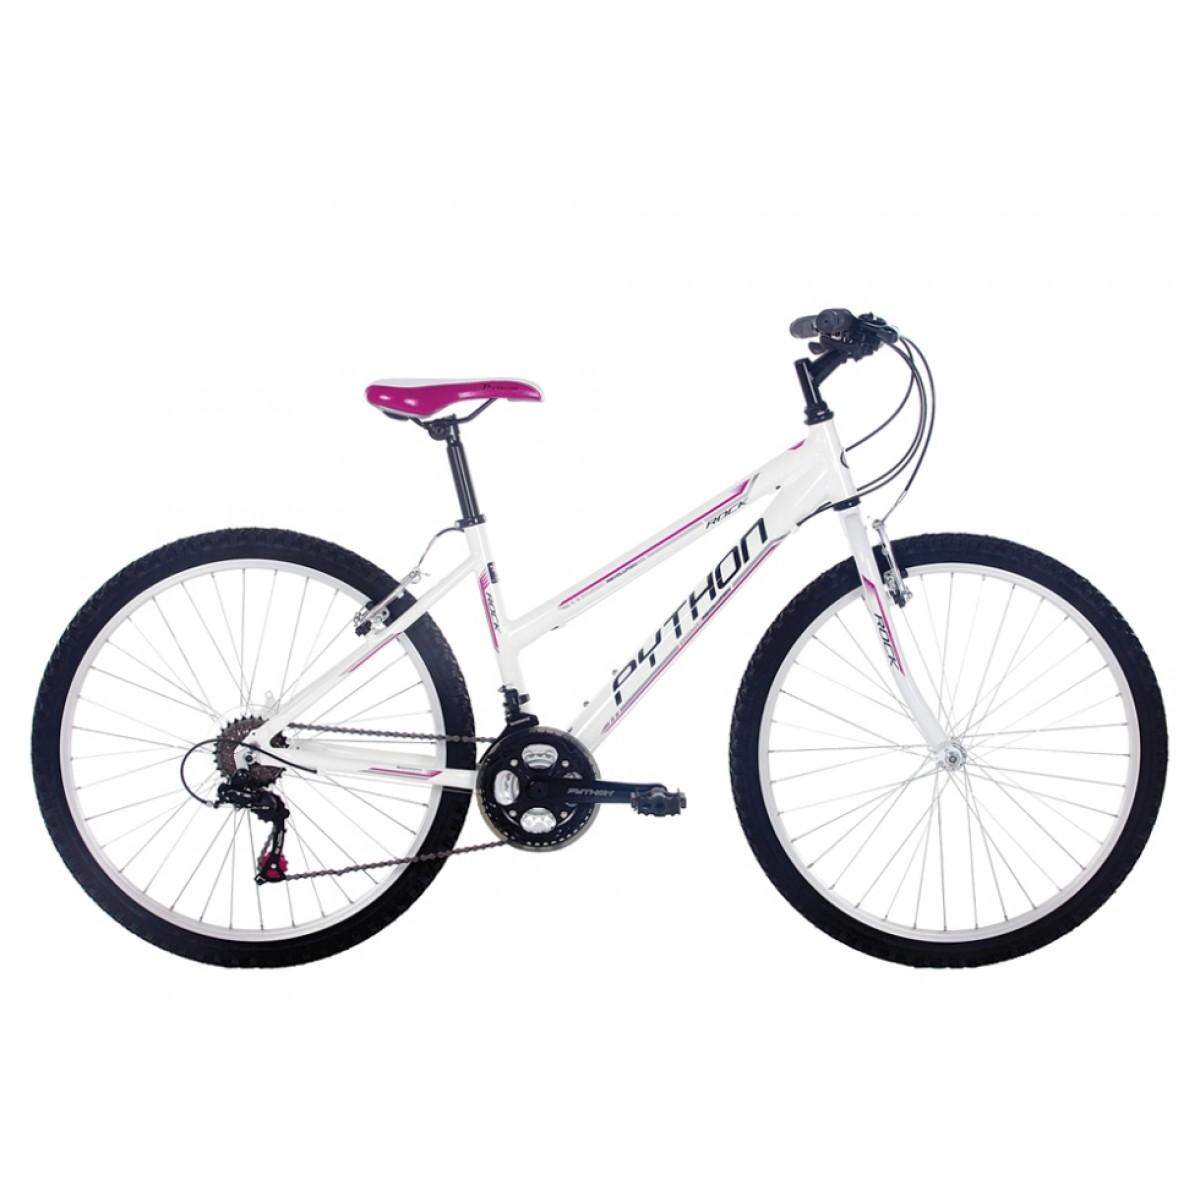 Python Rock Alloy Womens Rigid Mountain Bike